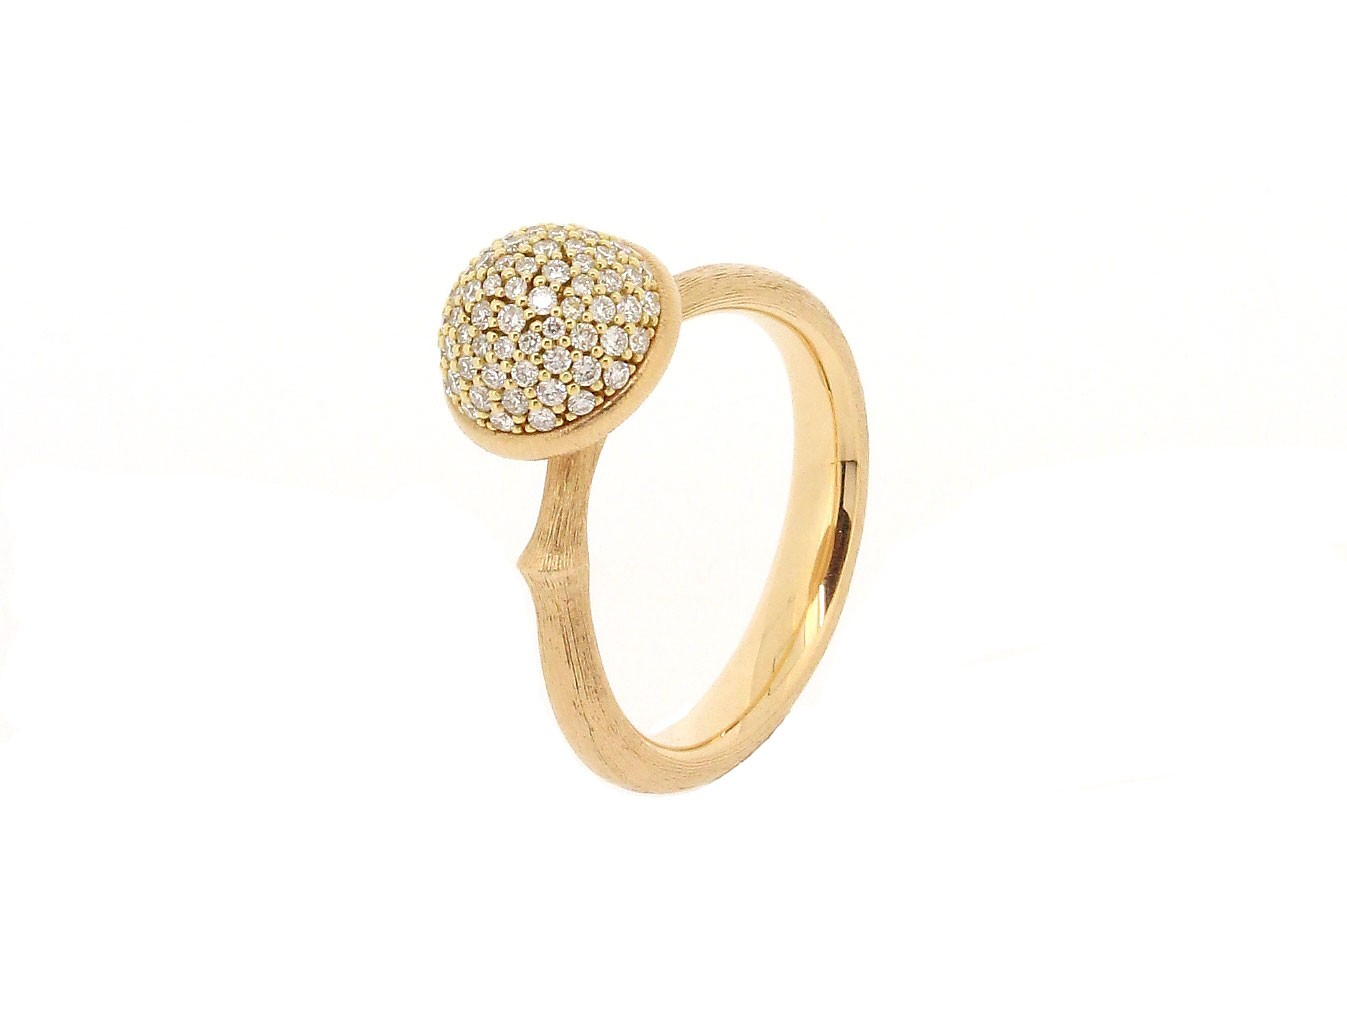 Ring Lotus Pavé 18ct Gold - Ole Lynggaard - A2711-701